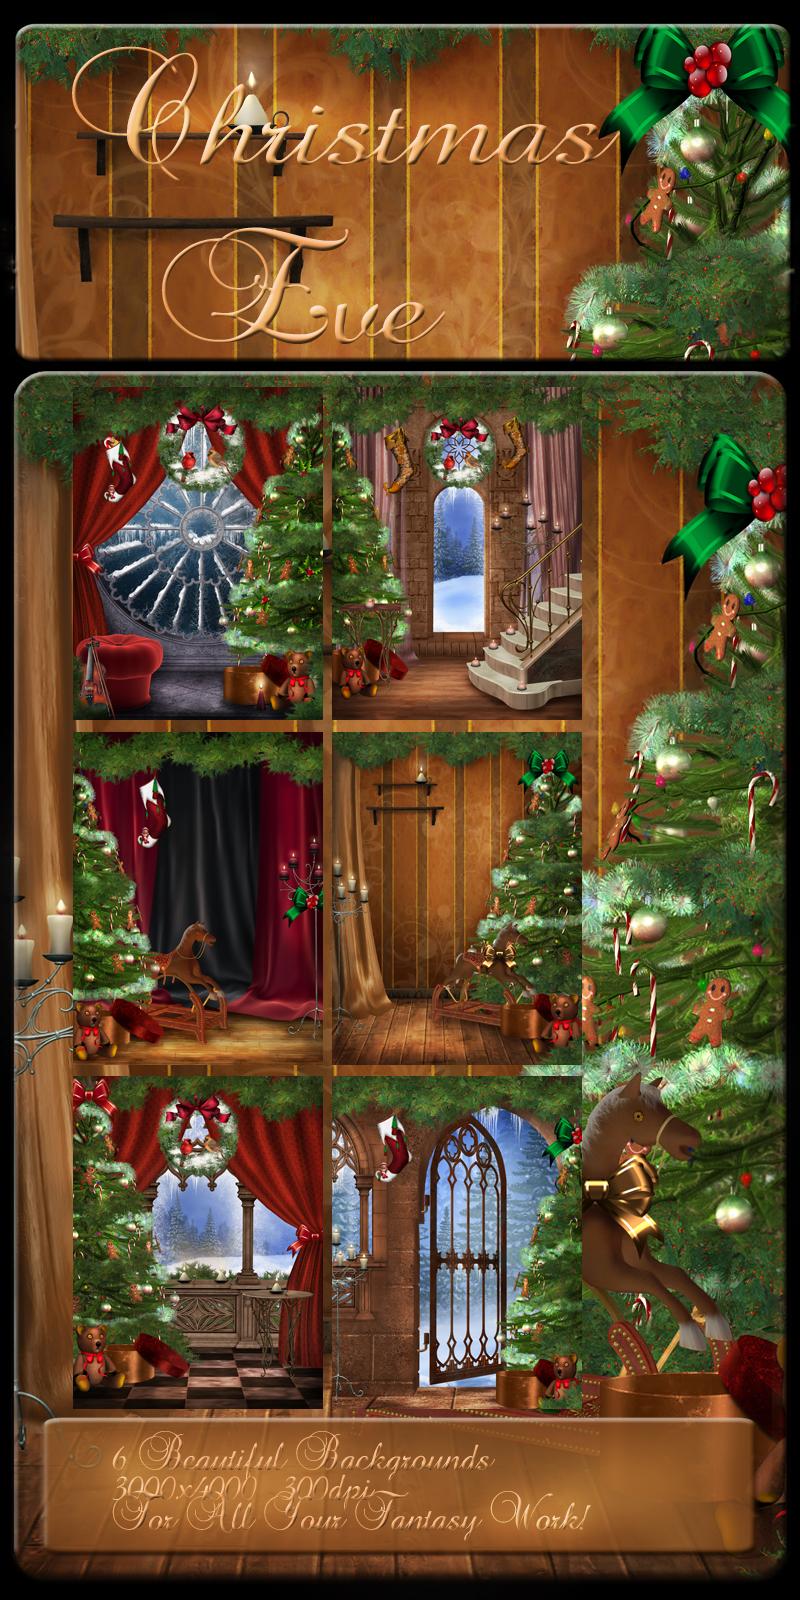 cover_Christmas_Eve2.jpg